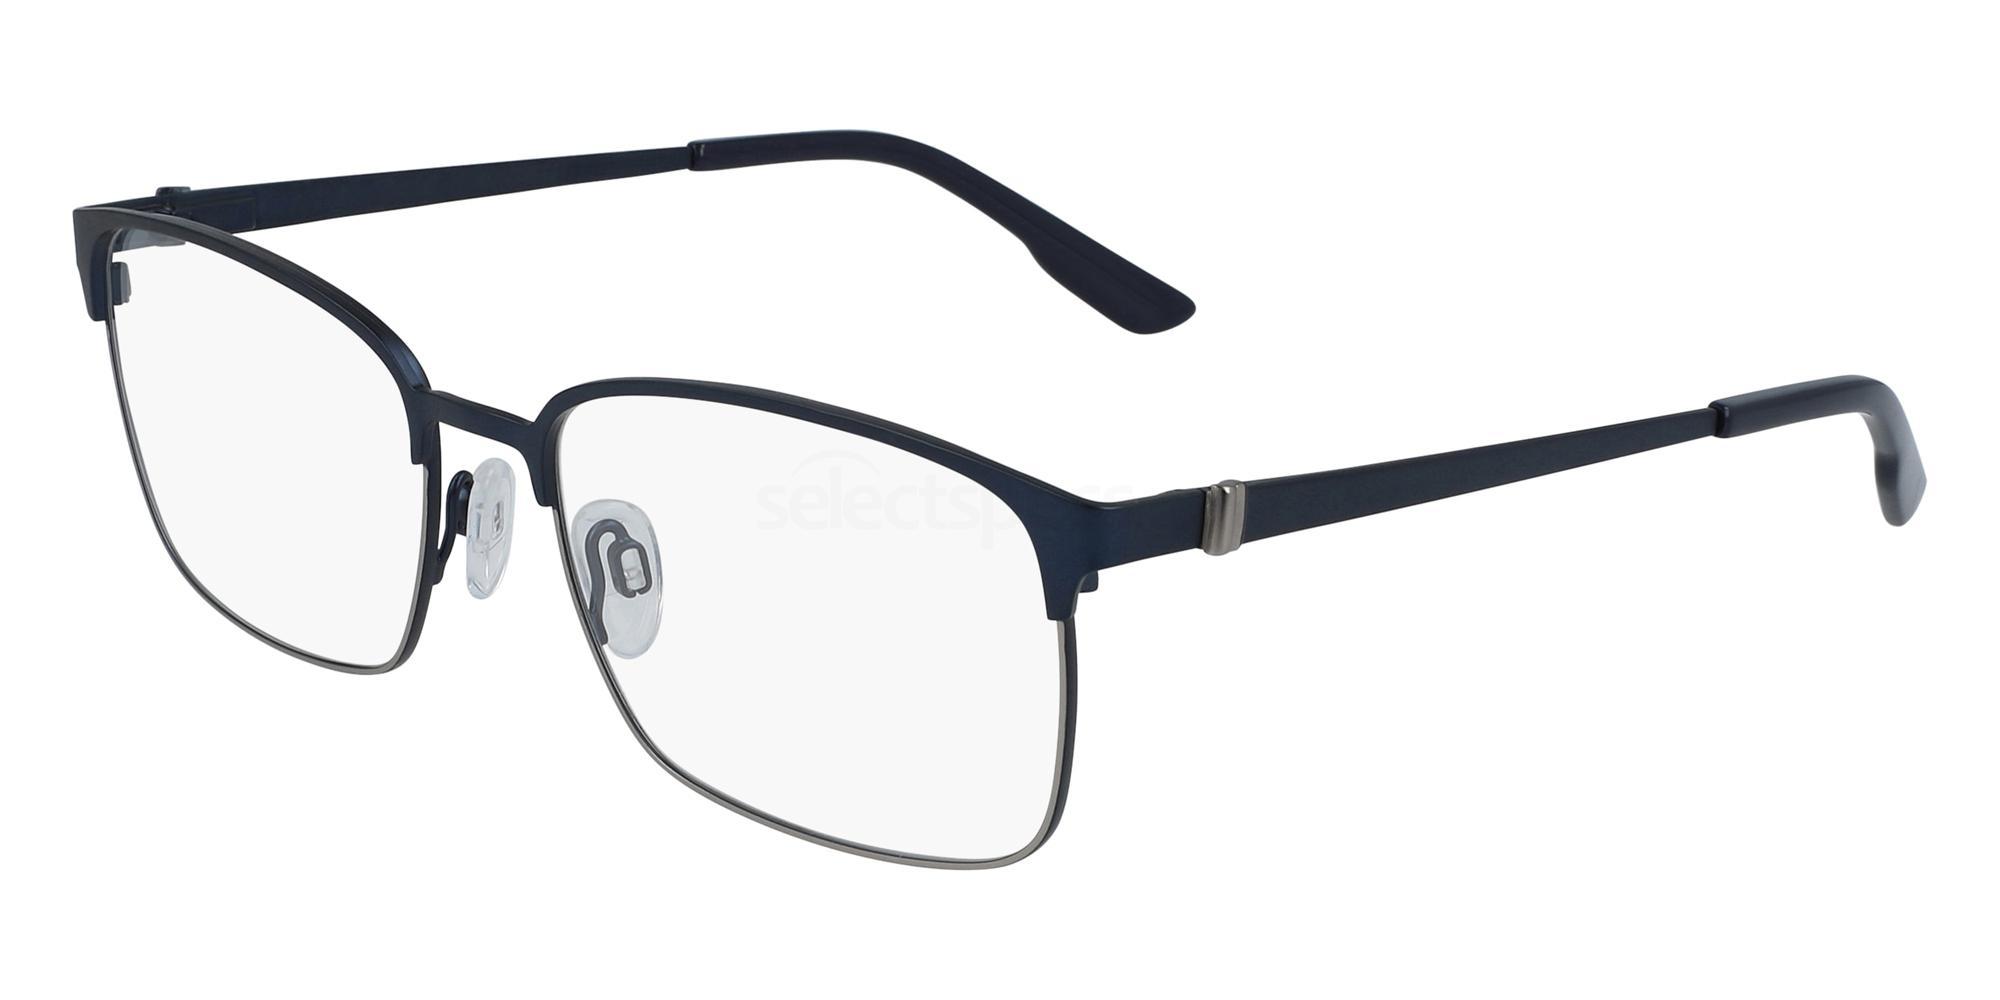 424 SK2104 ALPNYCKEL Glasses, Skaga